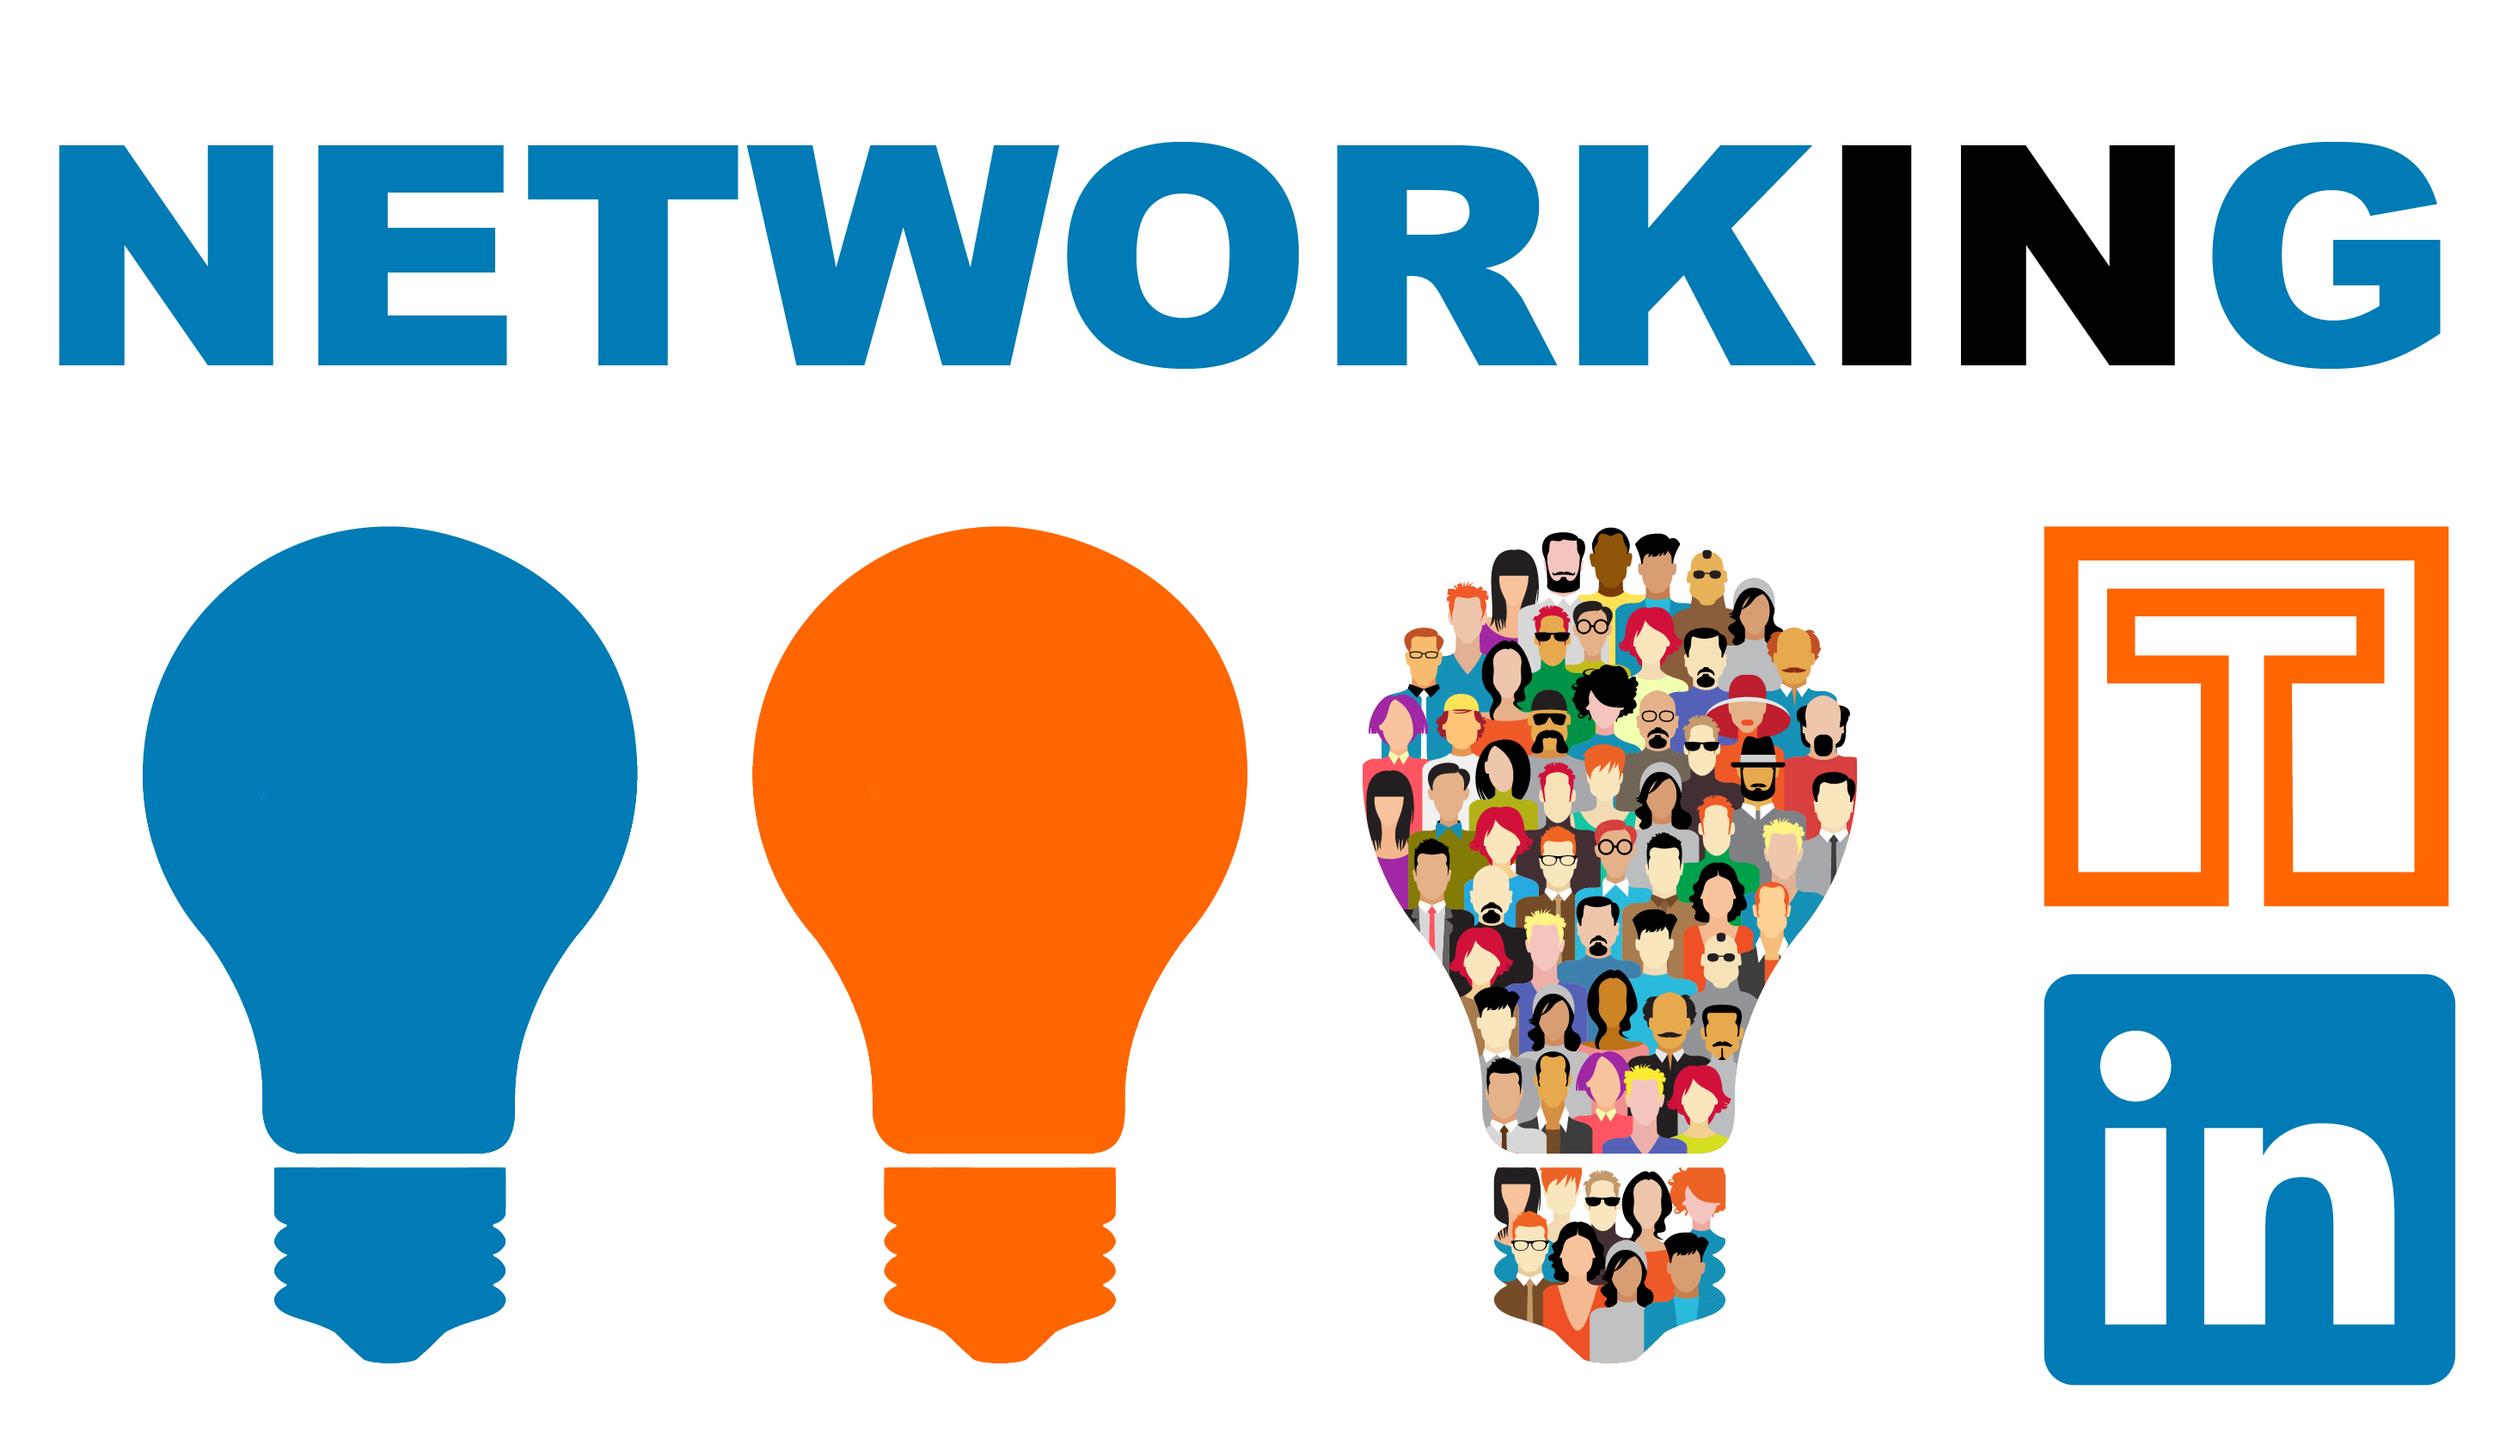 LinkedIn Networking - Not a Social Network